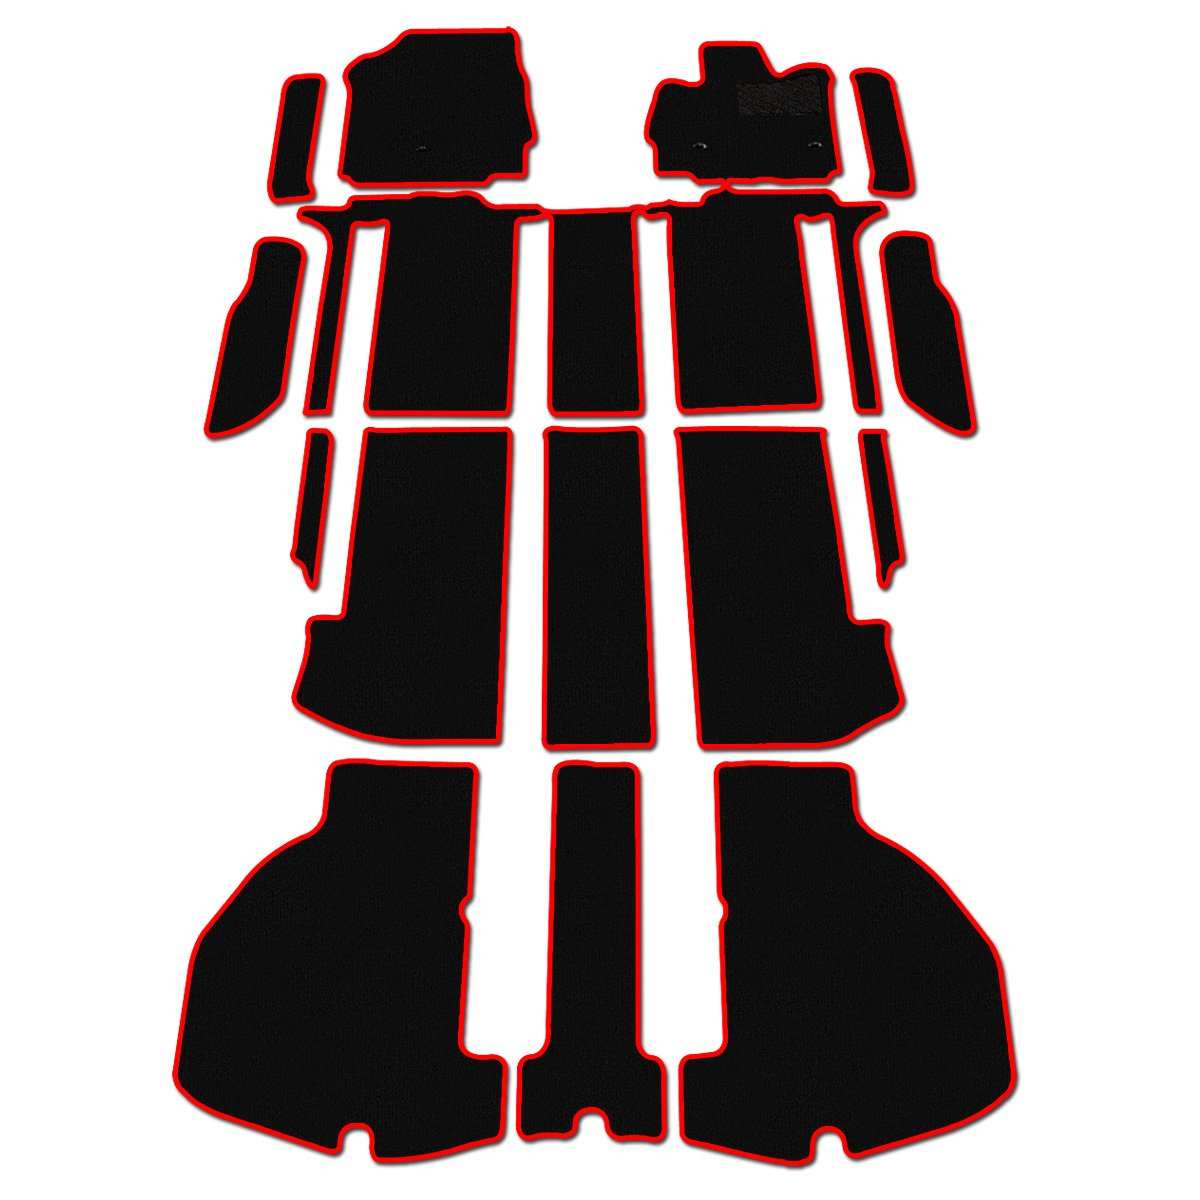 D.Iプランニング カー用品 フロアマット & ステップマット セット 型番3 【 トヨタ ヴェルファイア 30系 】 車用 カーマット 黒無地 赤フレーム B01J9C9UNM   型番3